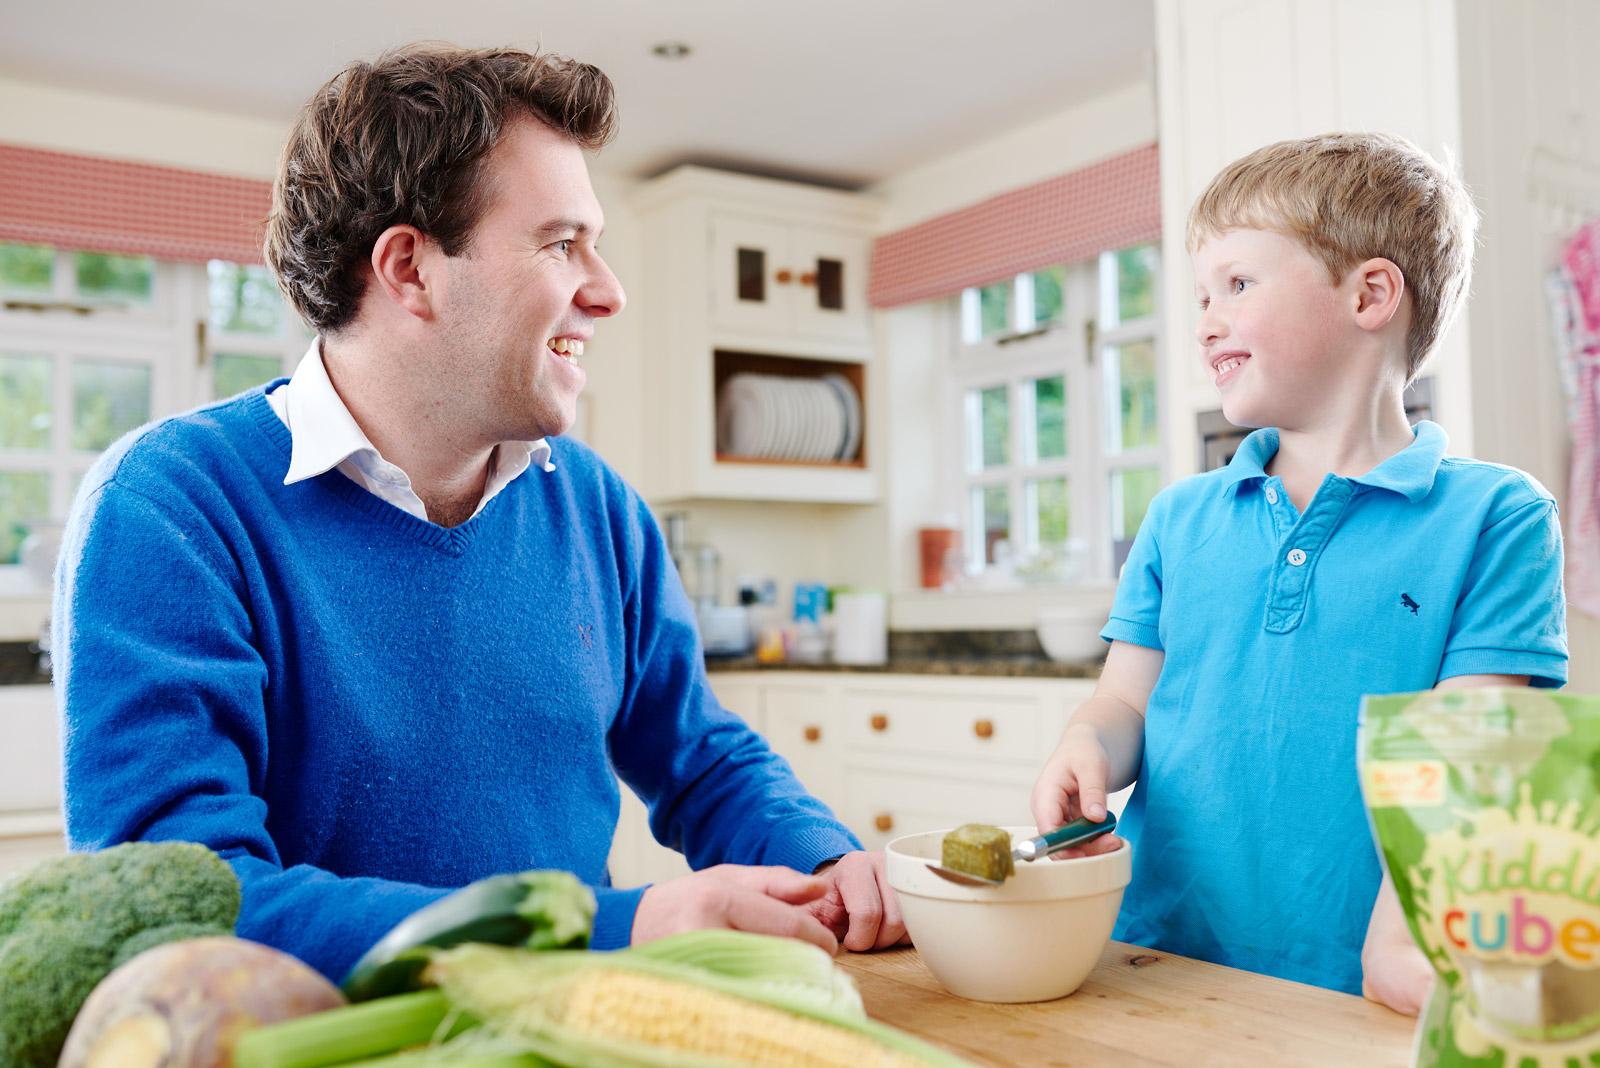 Kiddie Cubes kitchen family lifestyle shoot